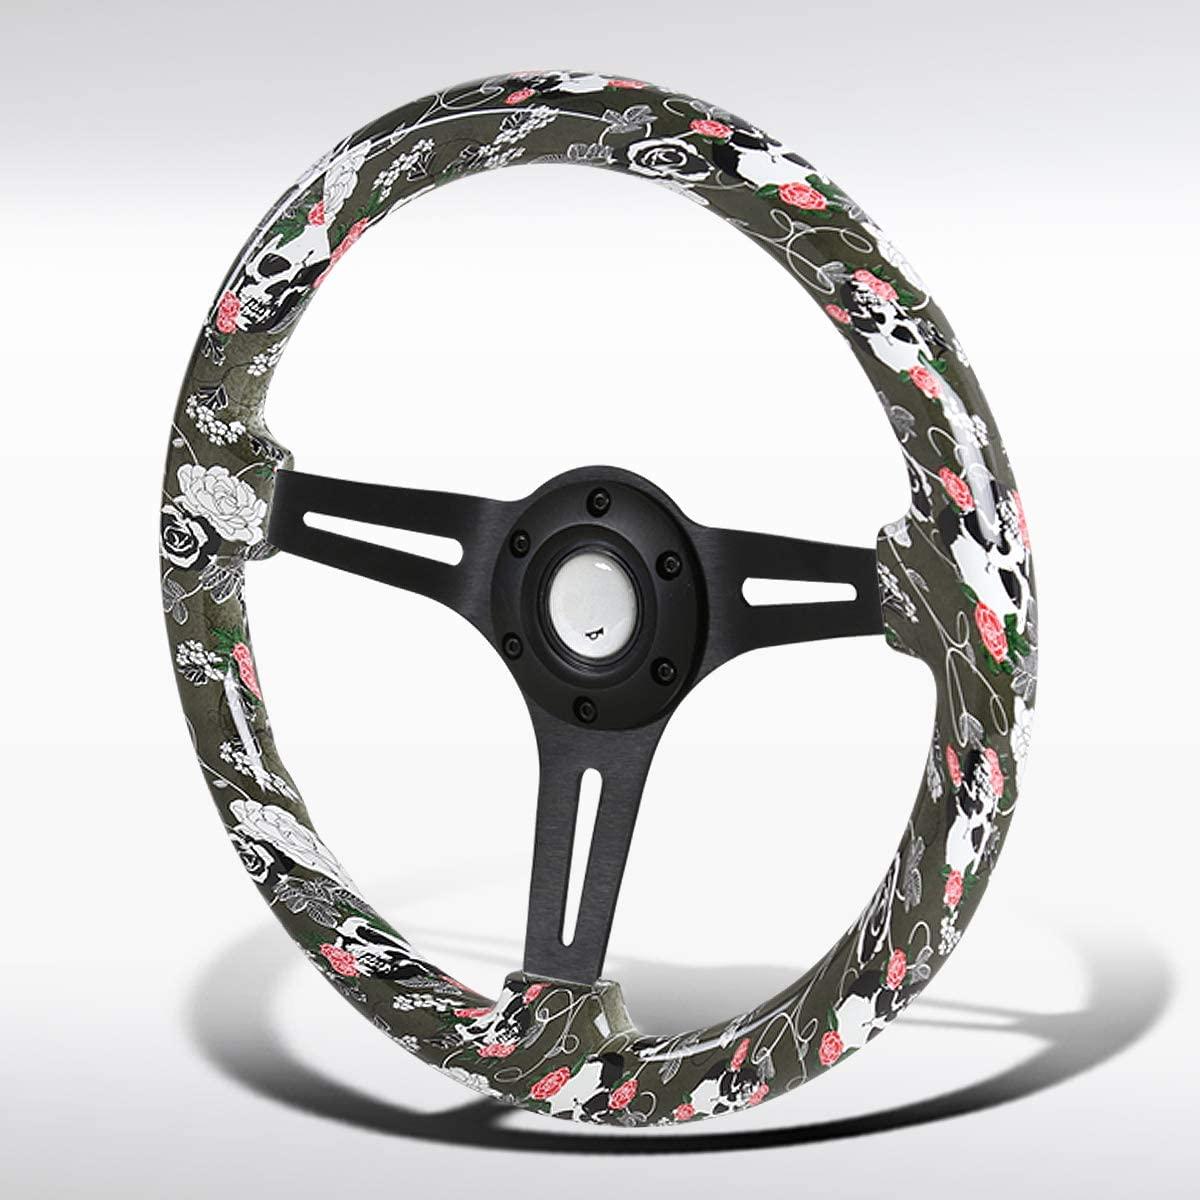 Autozensation Universal 350mm Green Skulls&Roses Black 3-Spoke Sport Wooden Steering Wheel